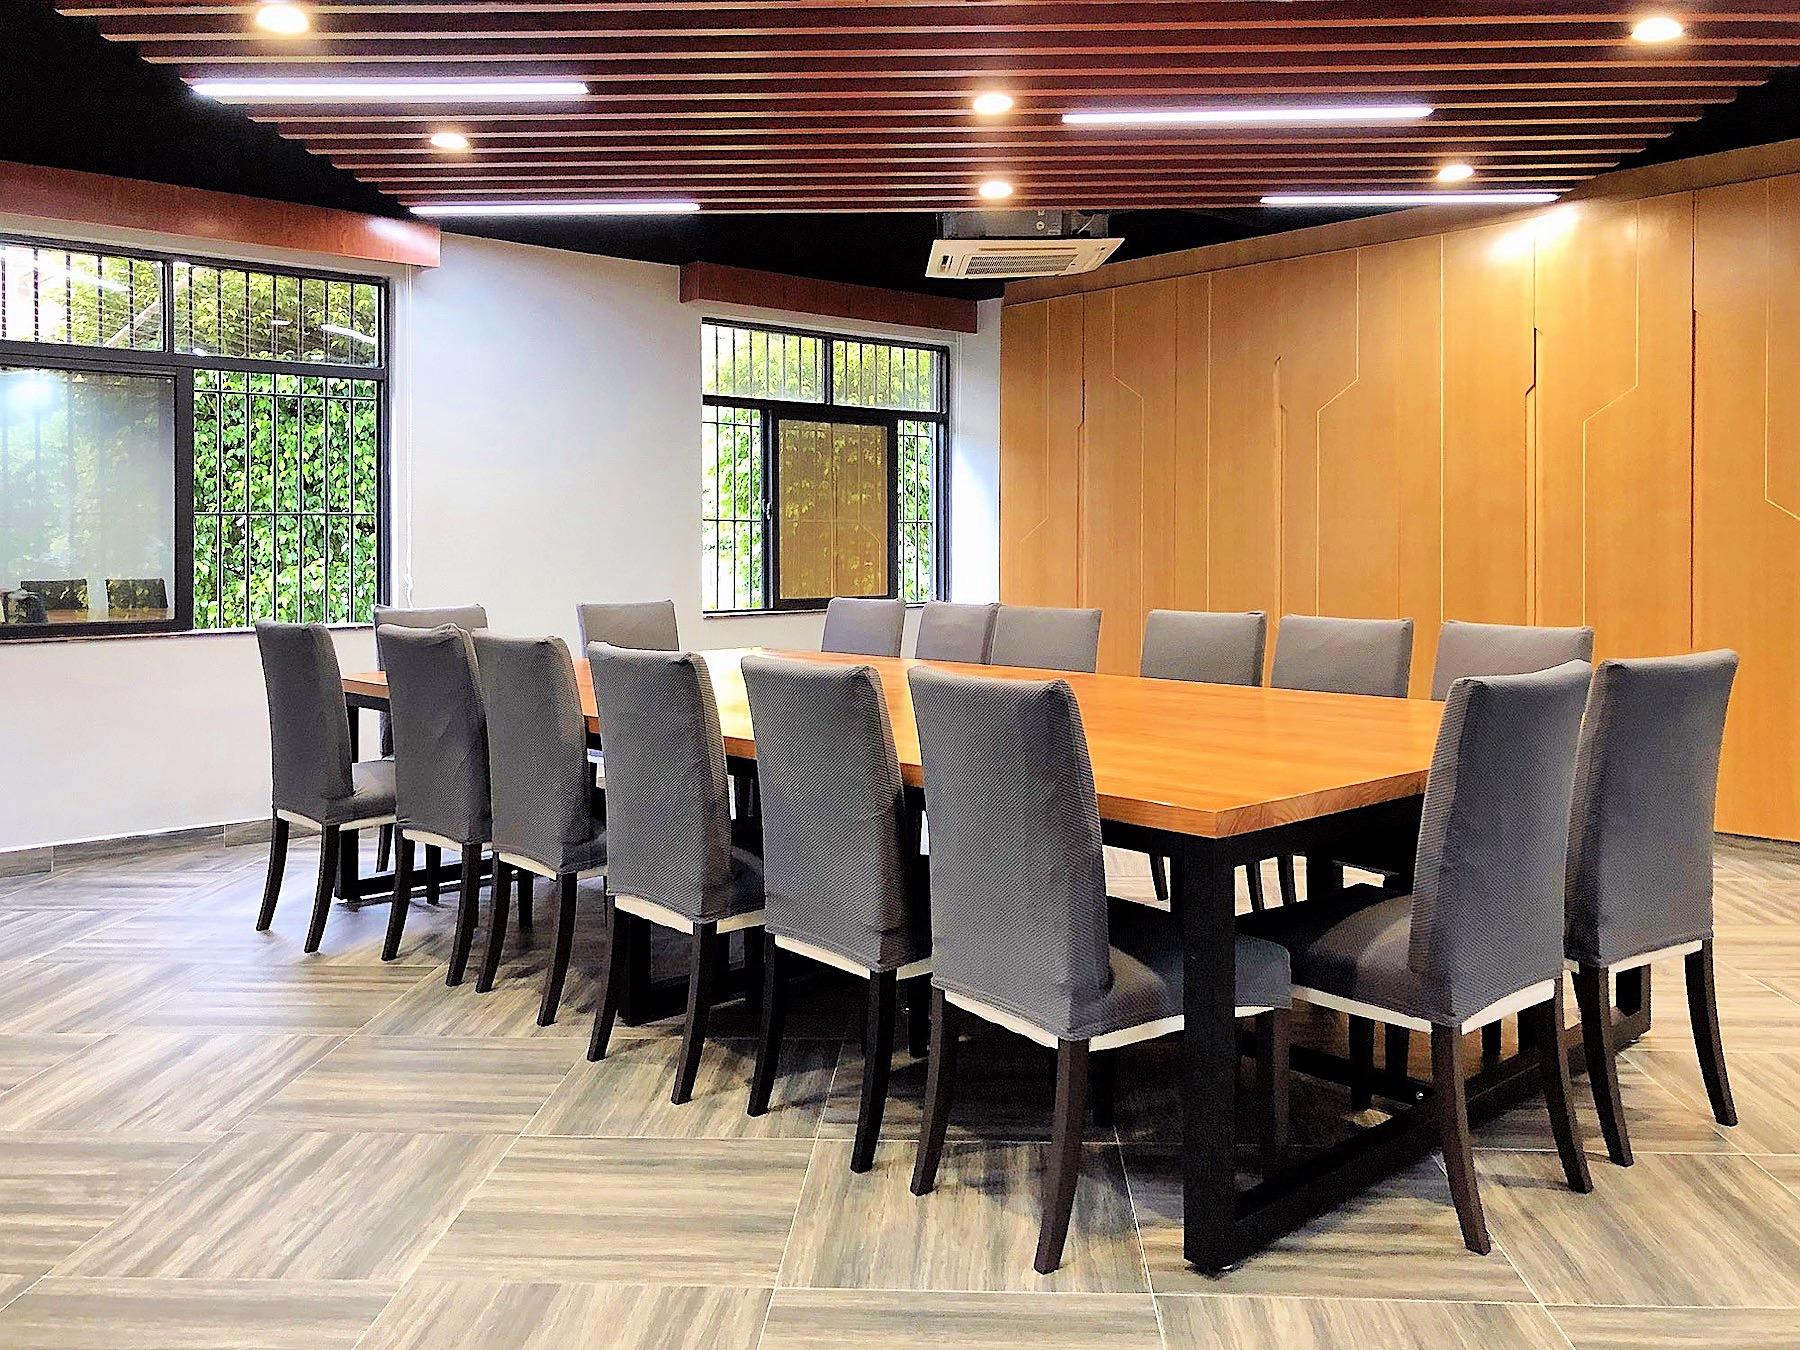 Grandway Office Renovation 2018 Multi Function Room 01 001